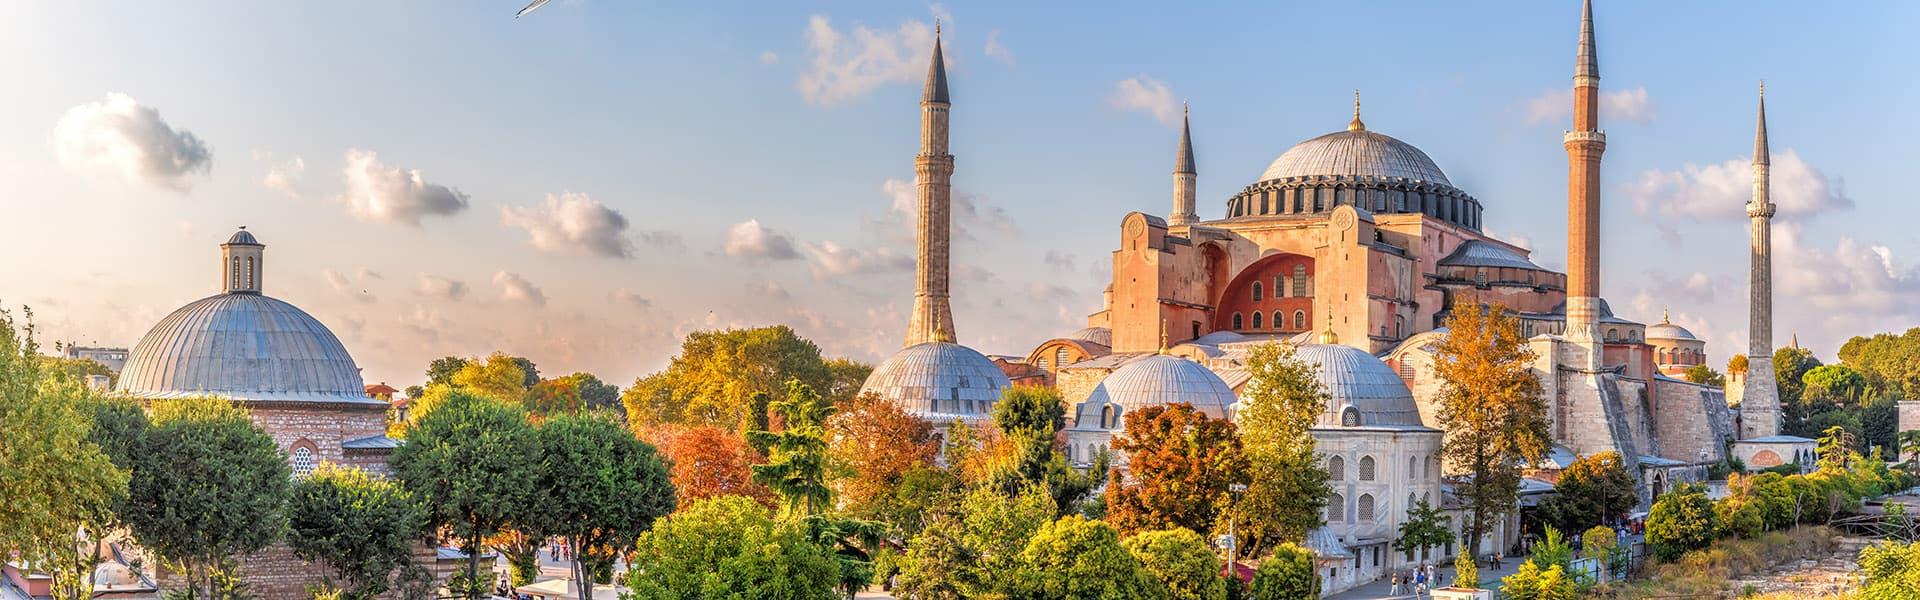 Mittelmeer:Istanbul, VolosundPalermo